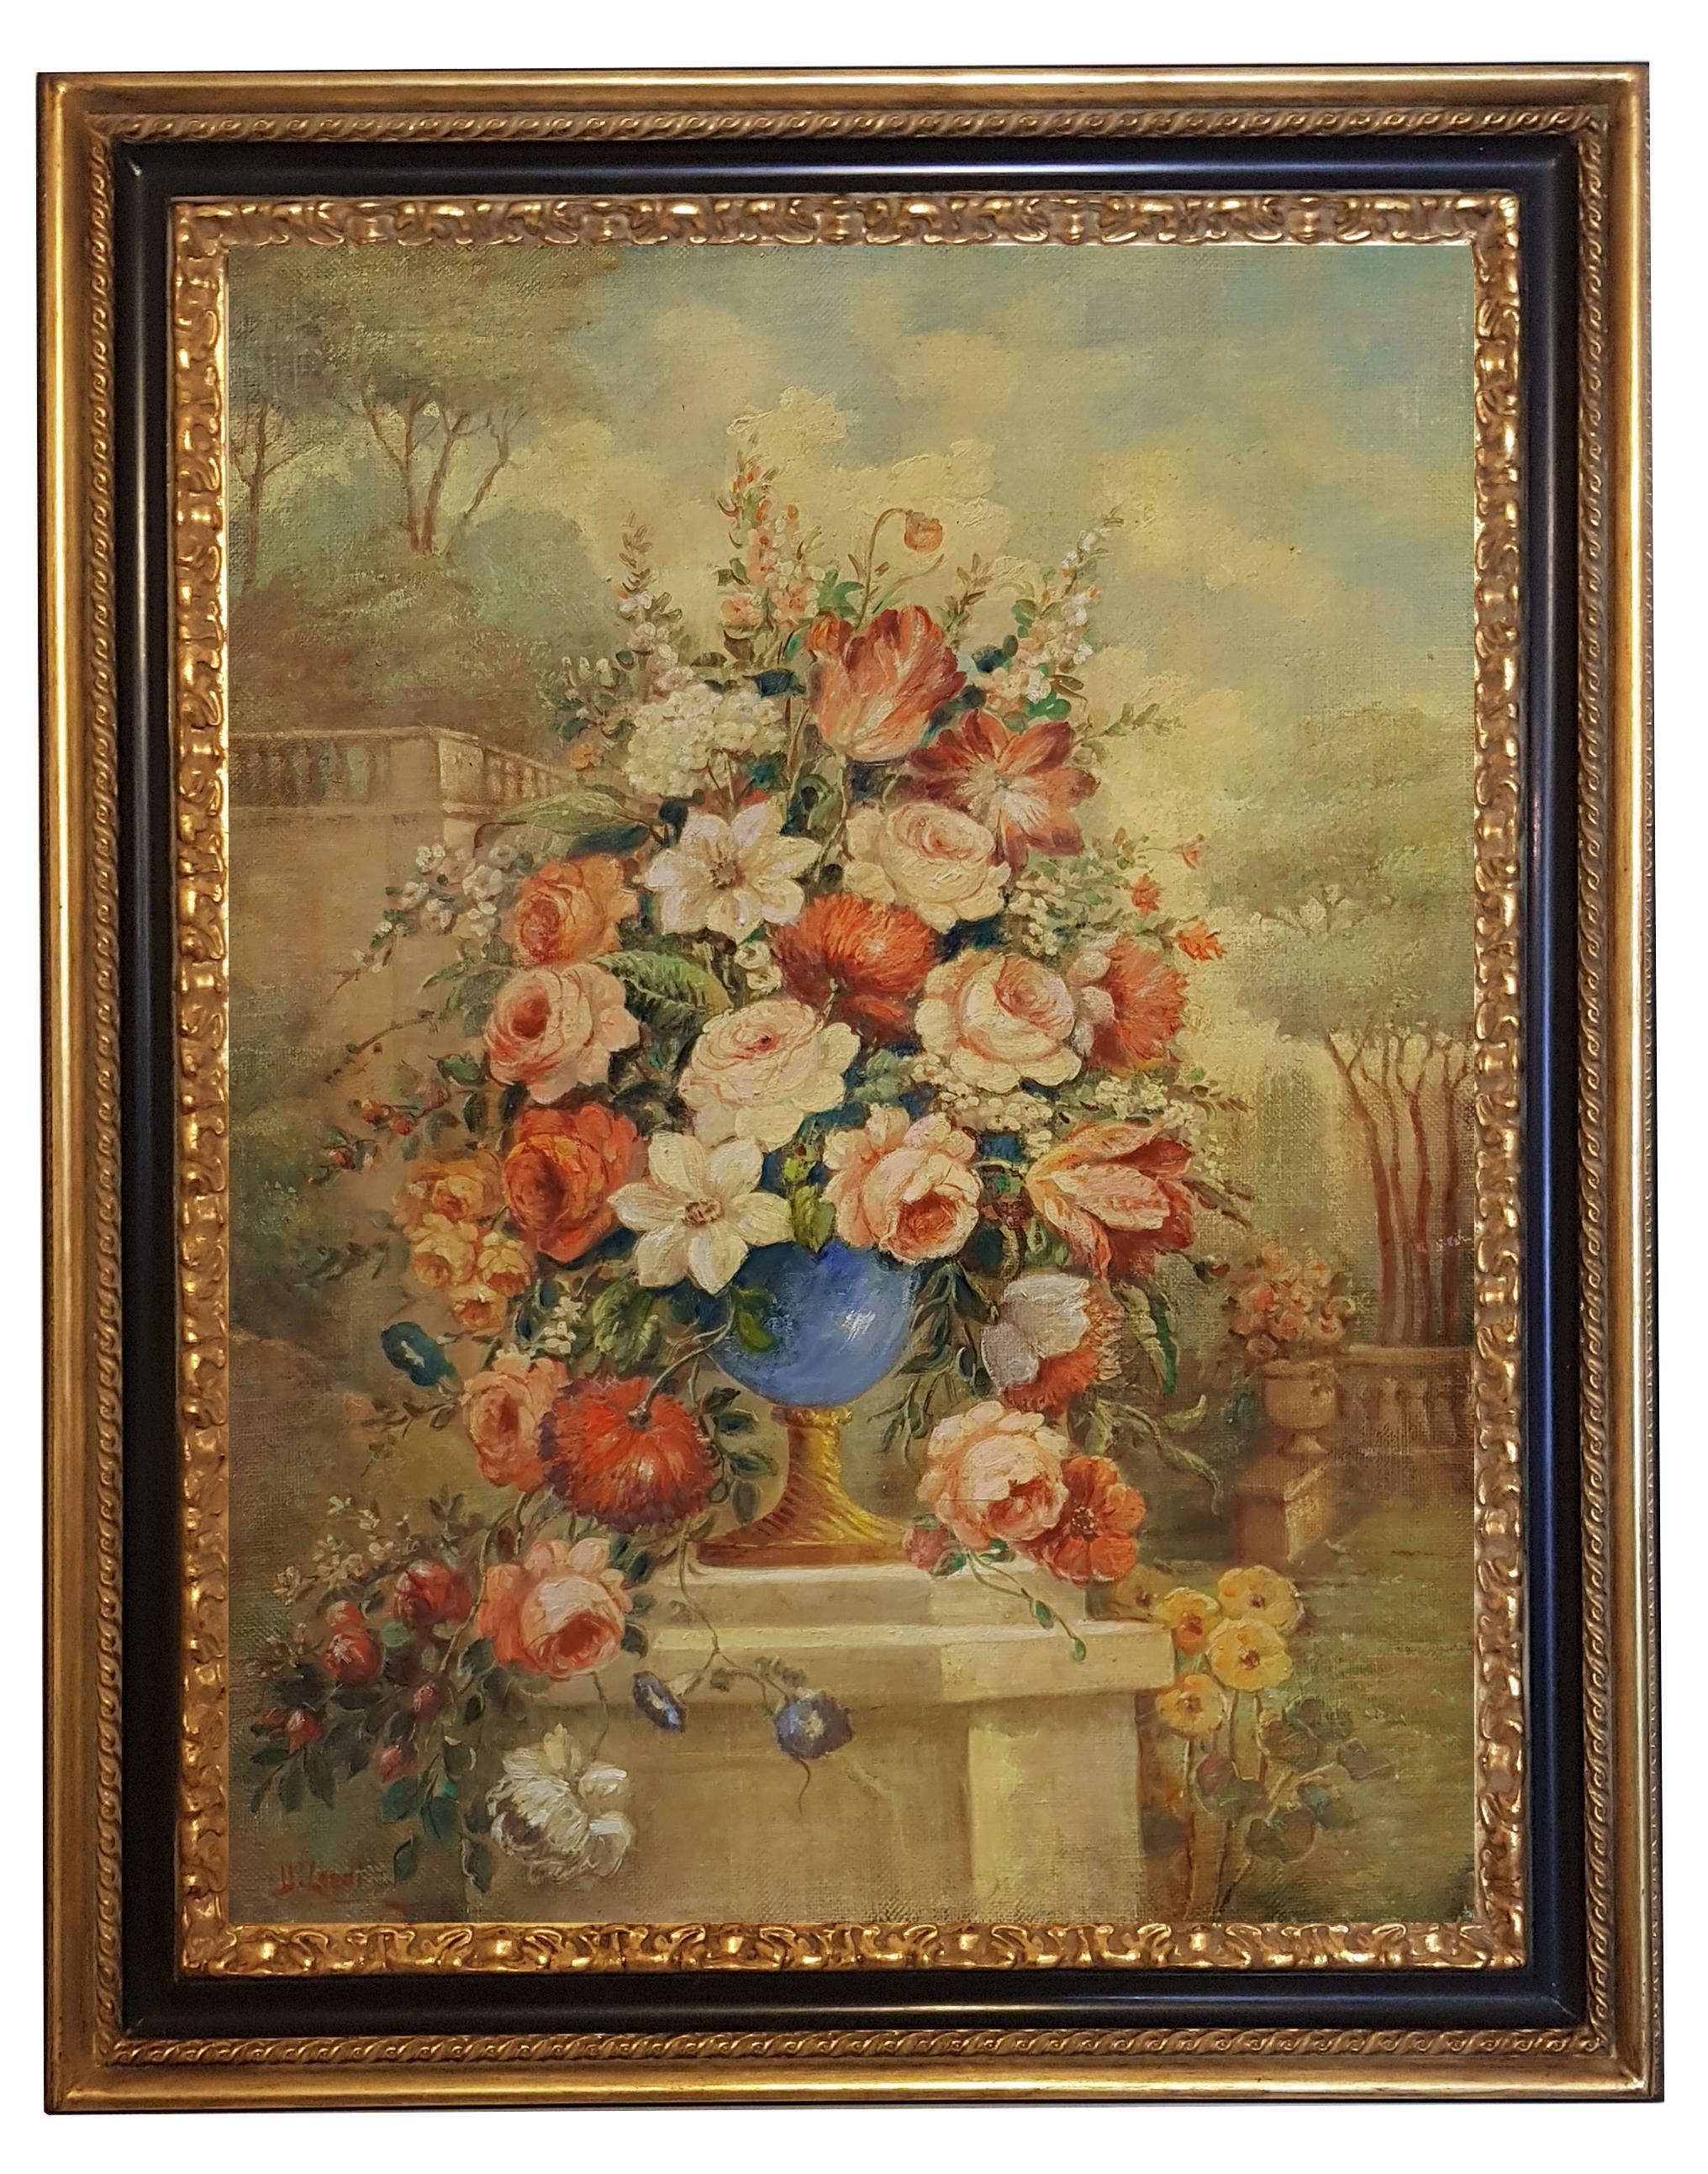 FLOWERS- In the Manner of  Gasparo Lopez dei Fiori - Neapolitan School - Paint